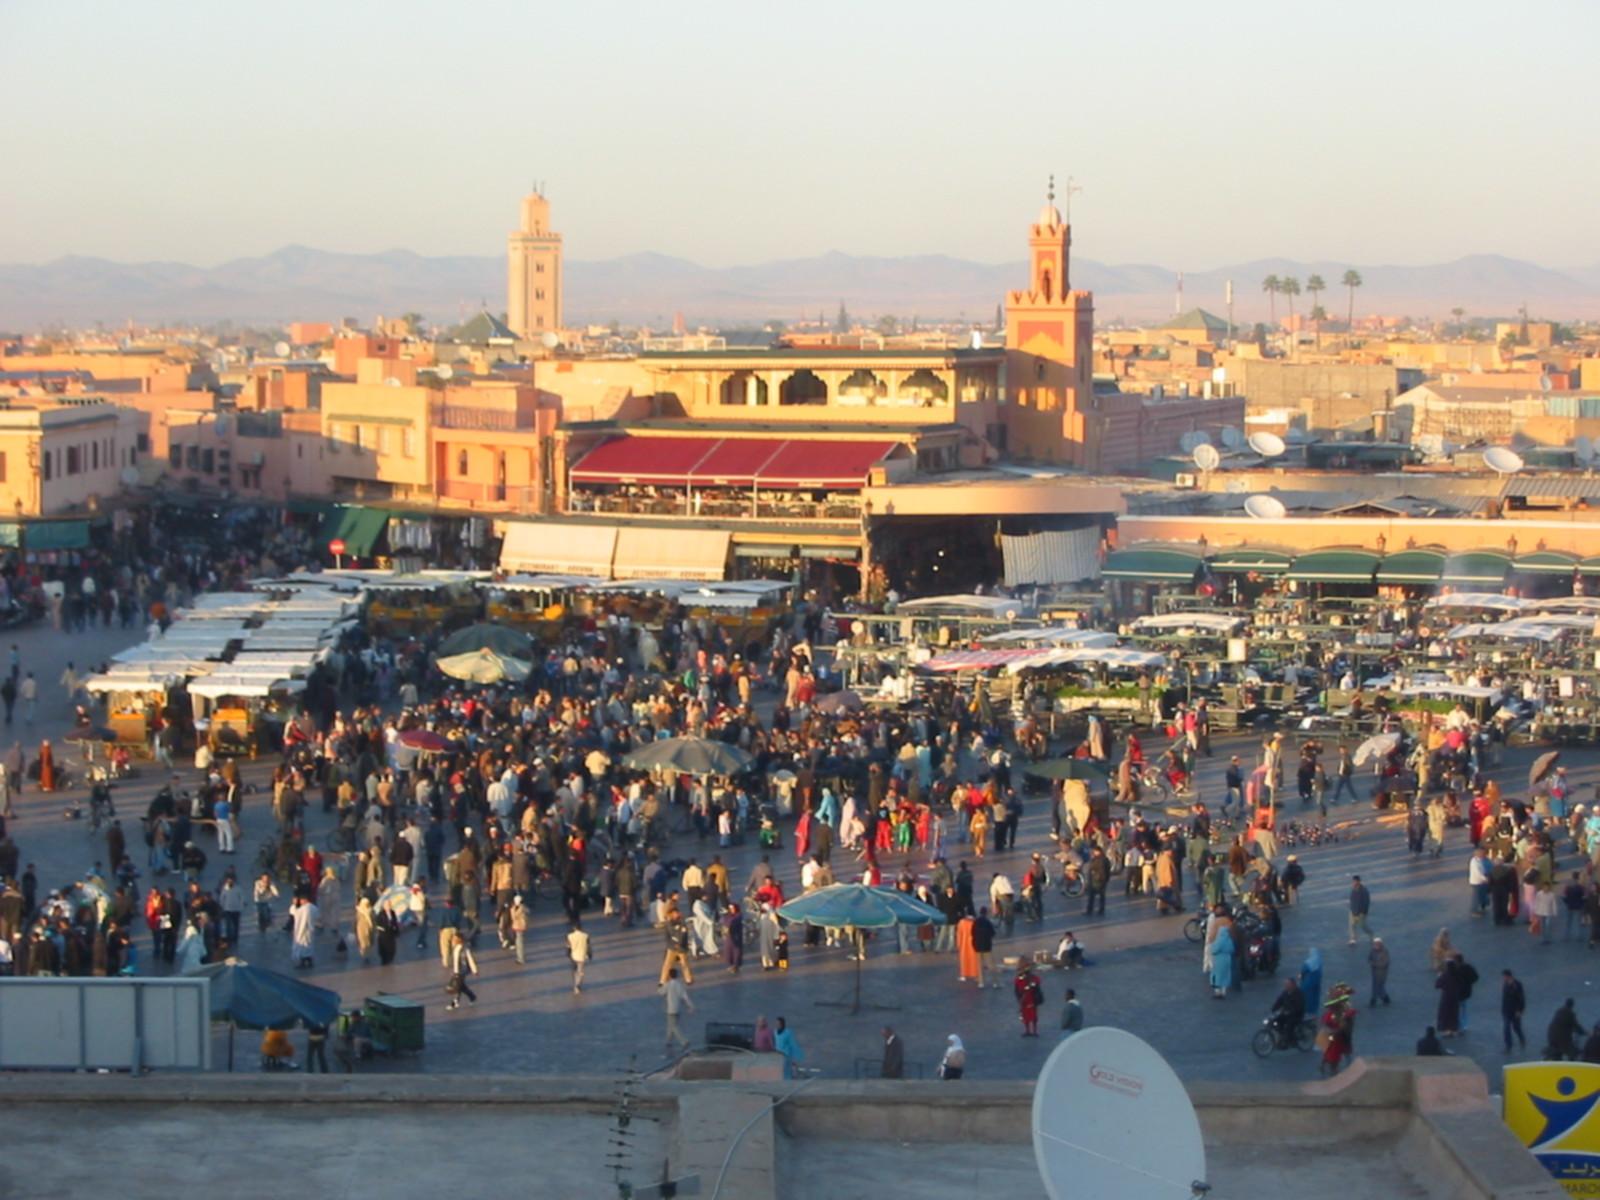 https://i2.wp.com/wikitravel.org/upload/shared/f/f1/Morroco_Djemaa_el_Fna_Evening.jpg